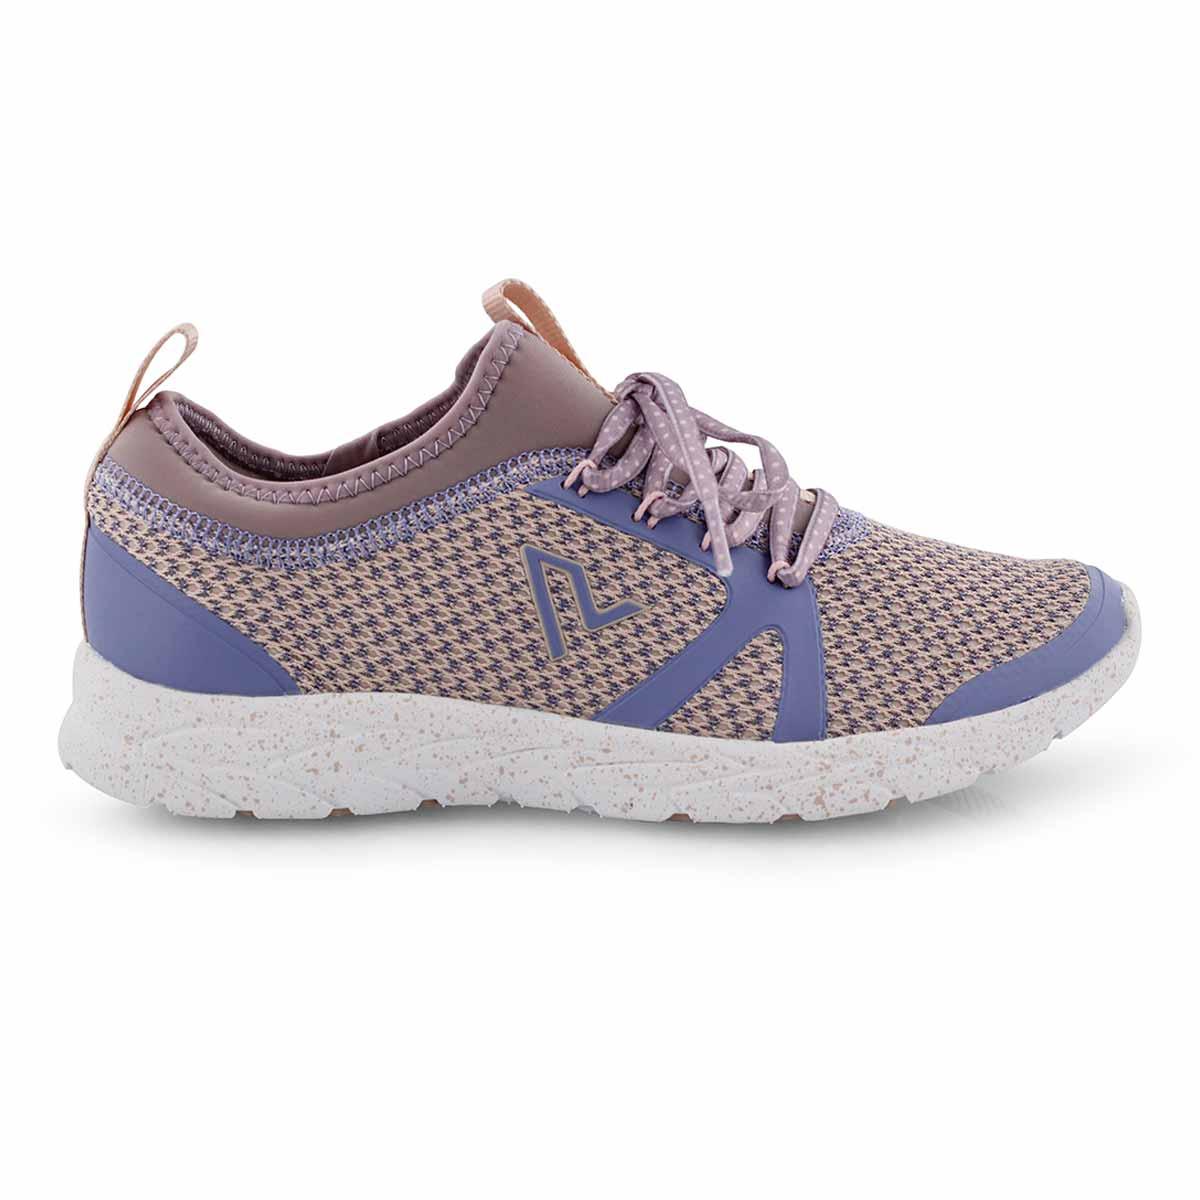 Lds Alma purple/multi lace up sneaker